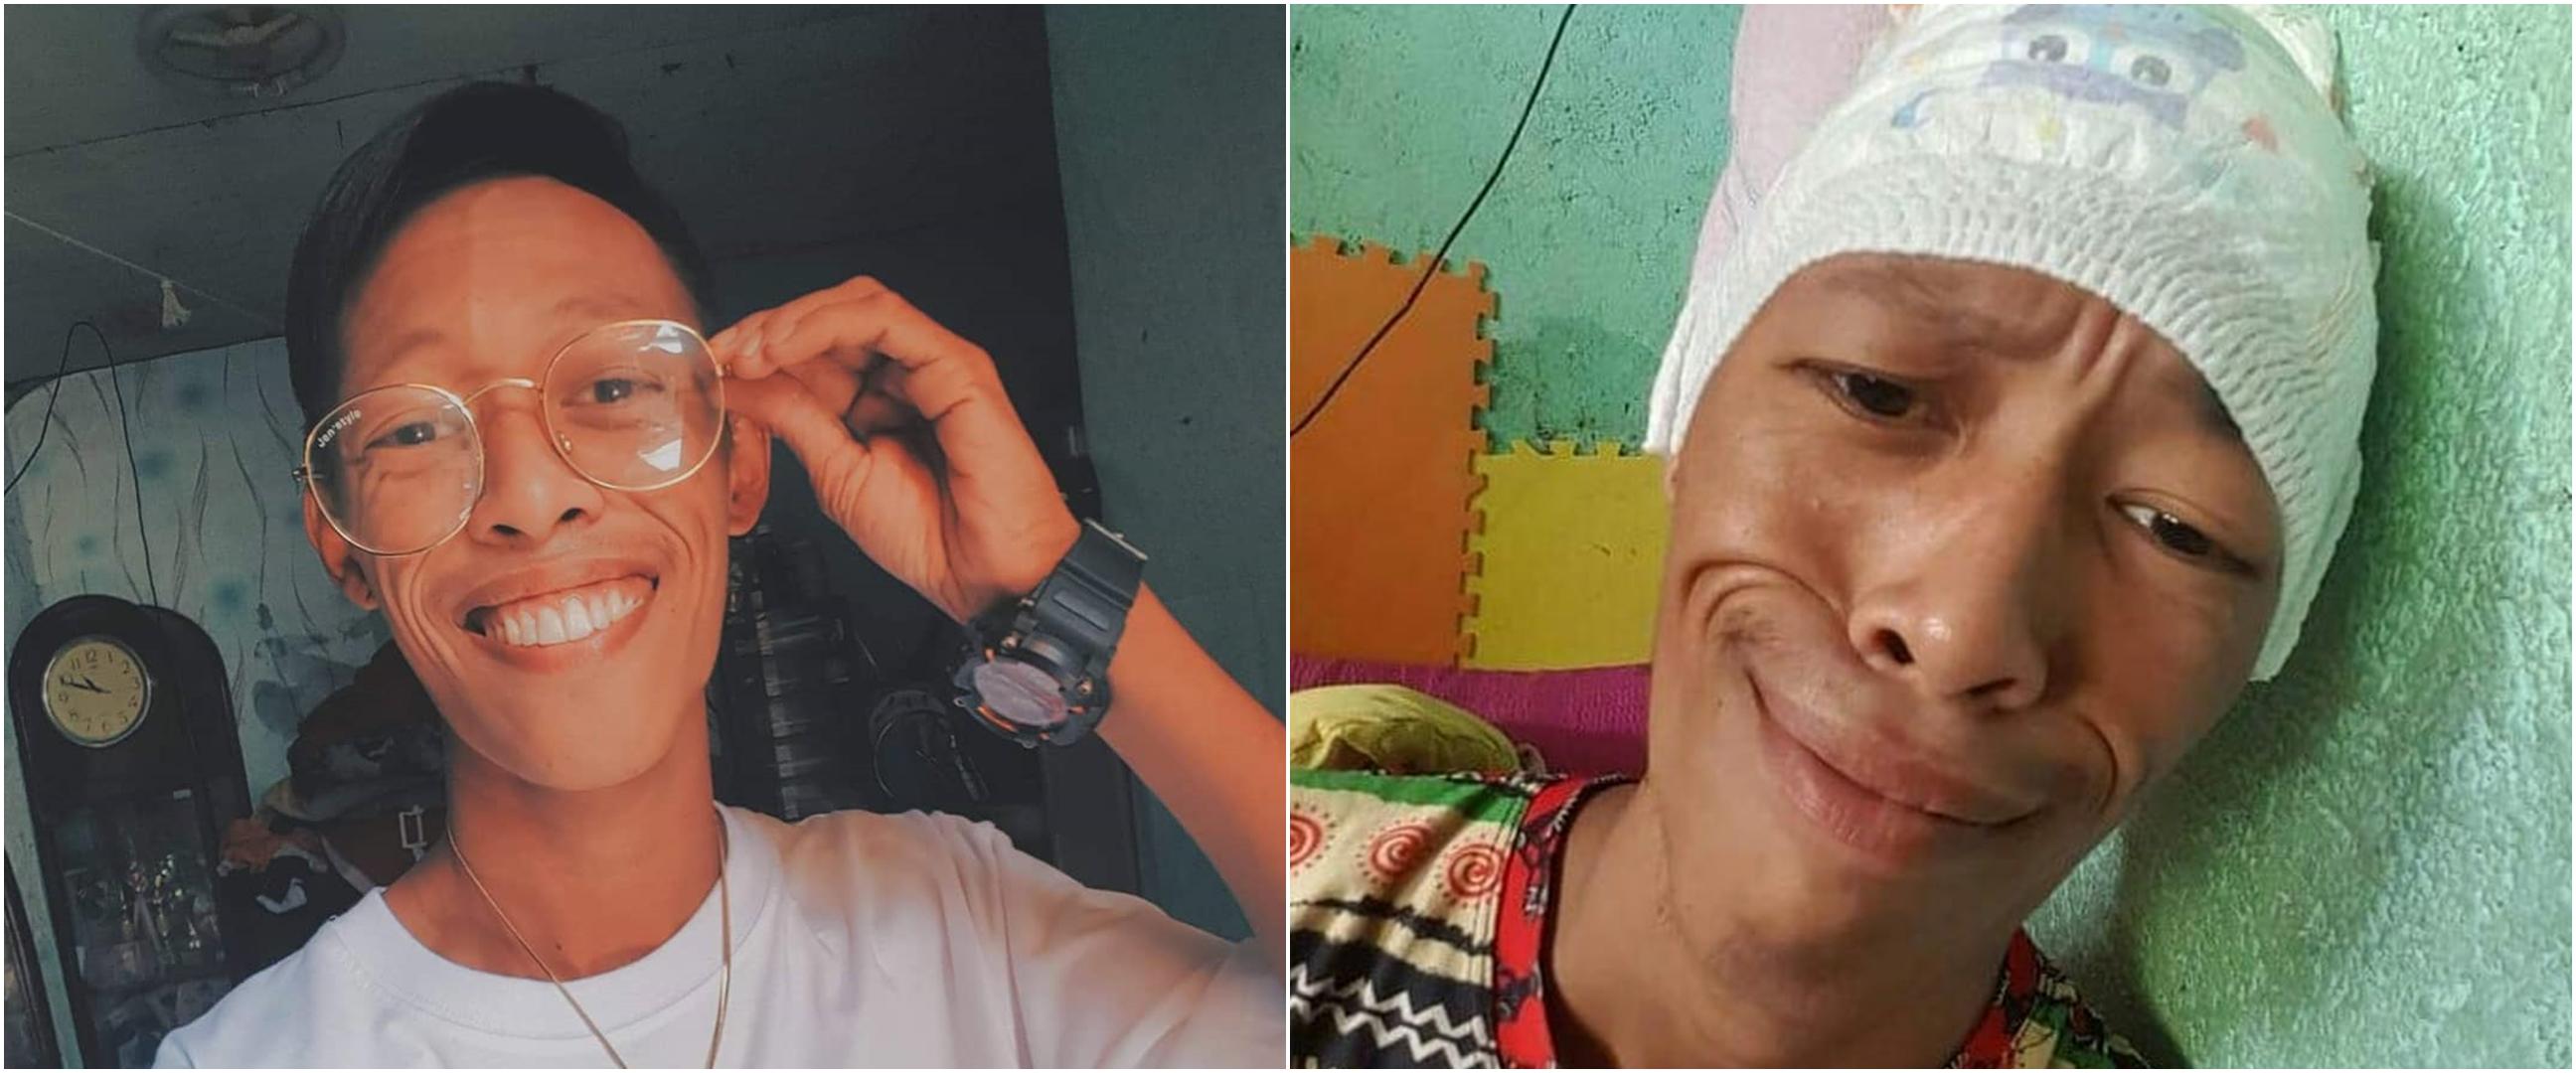 8 Video lucu Whamos, artis TikTok Filipina 'idola' netizen Indonesia